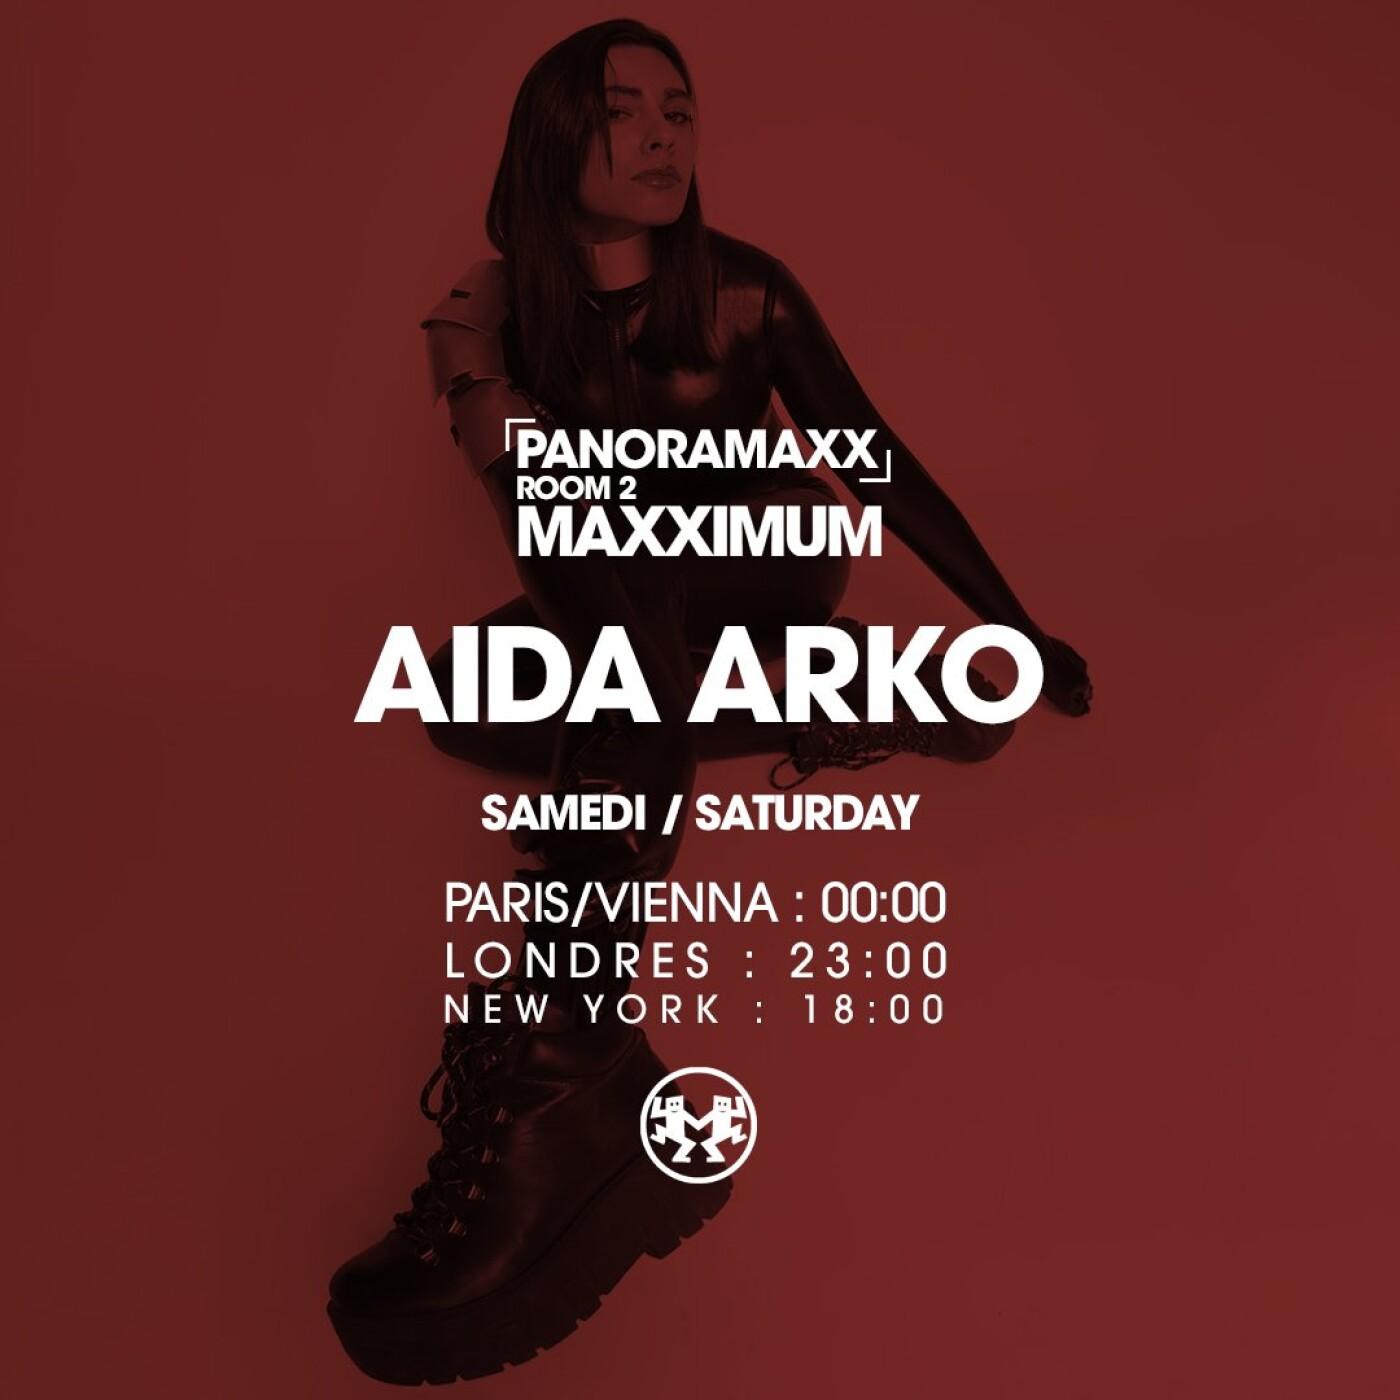 PANORAMAXX : AIDA ARKO